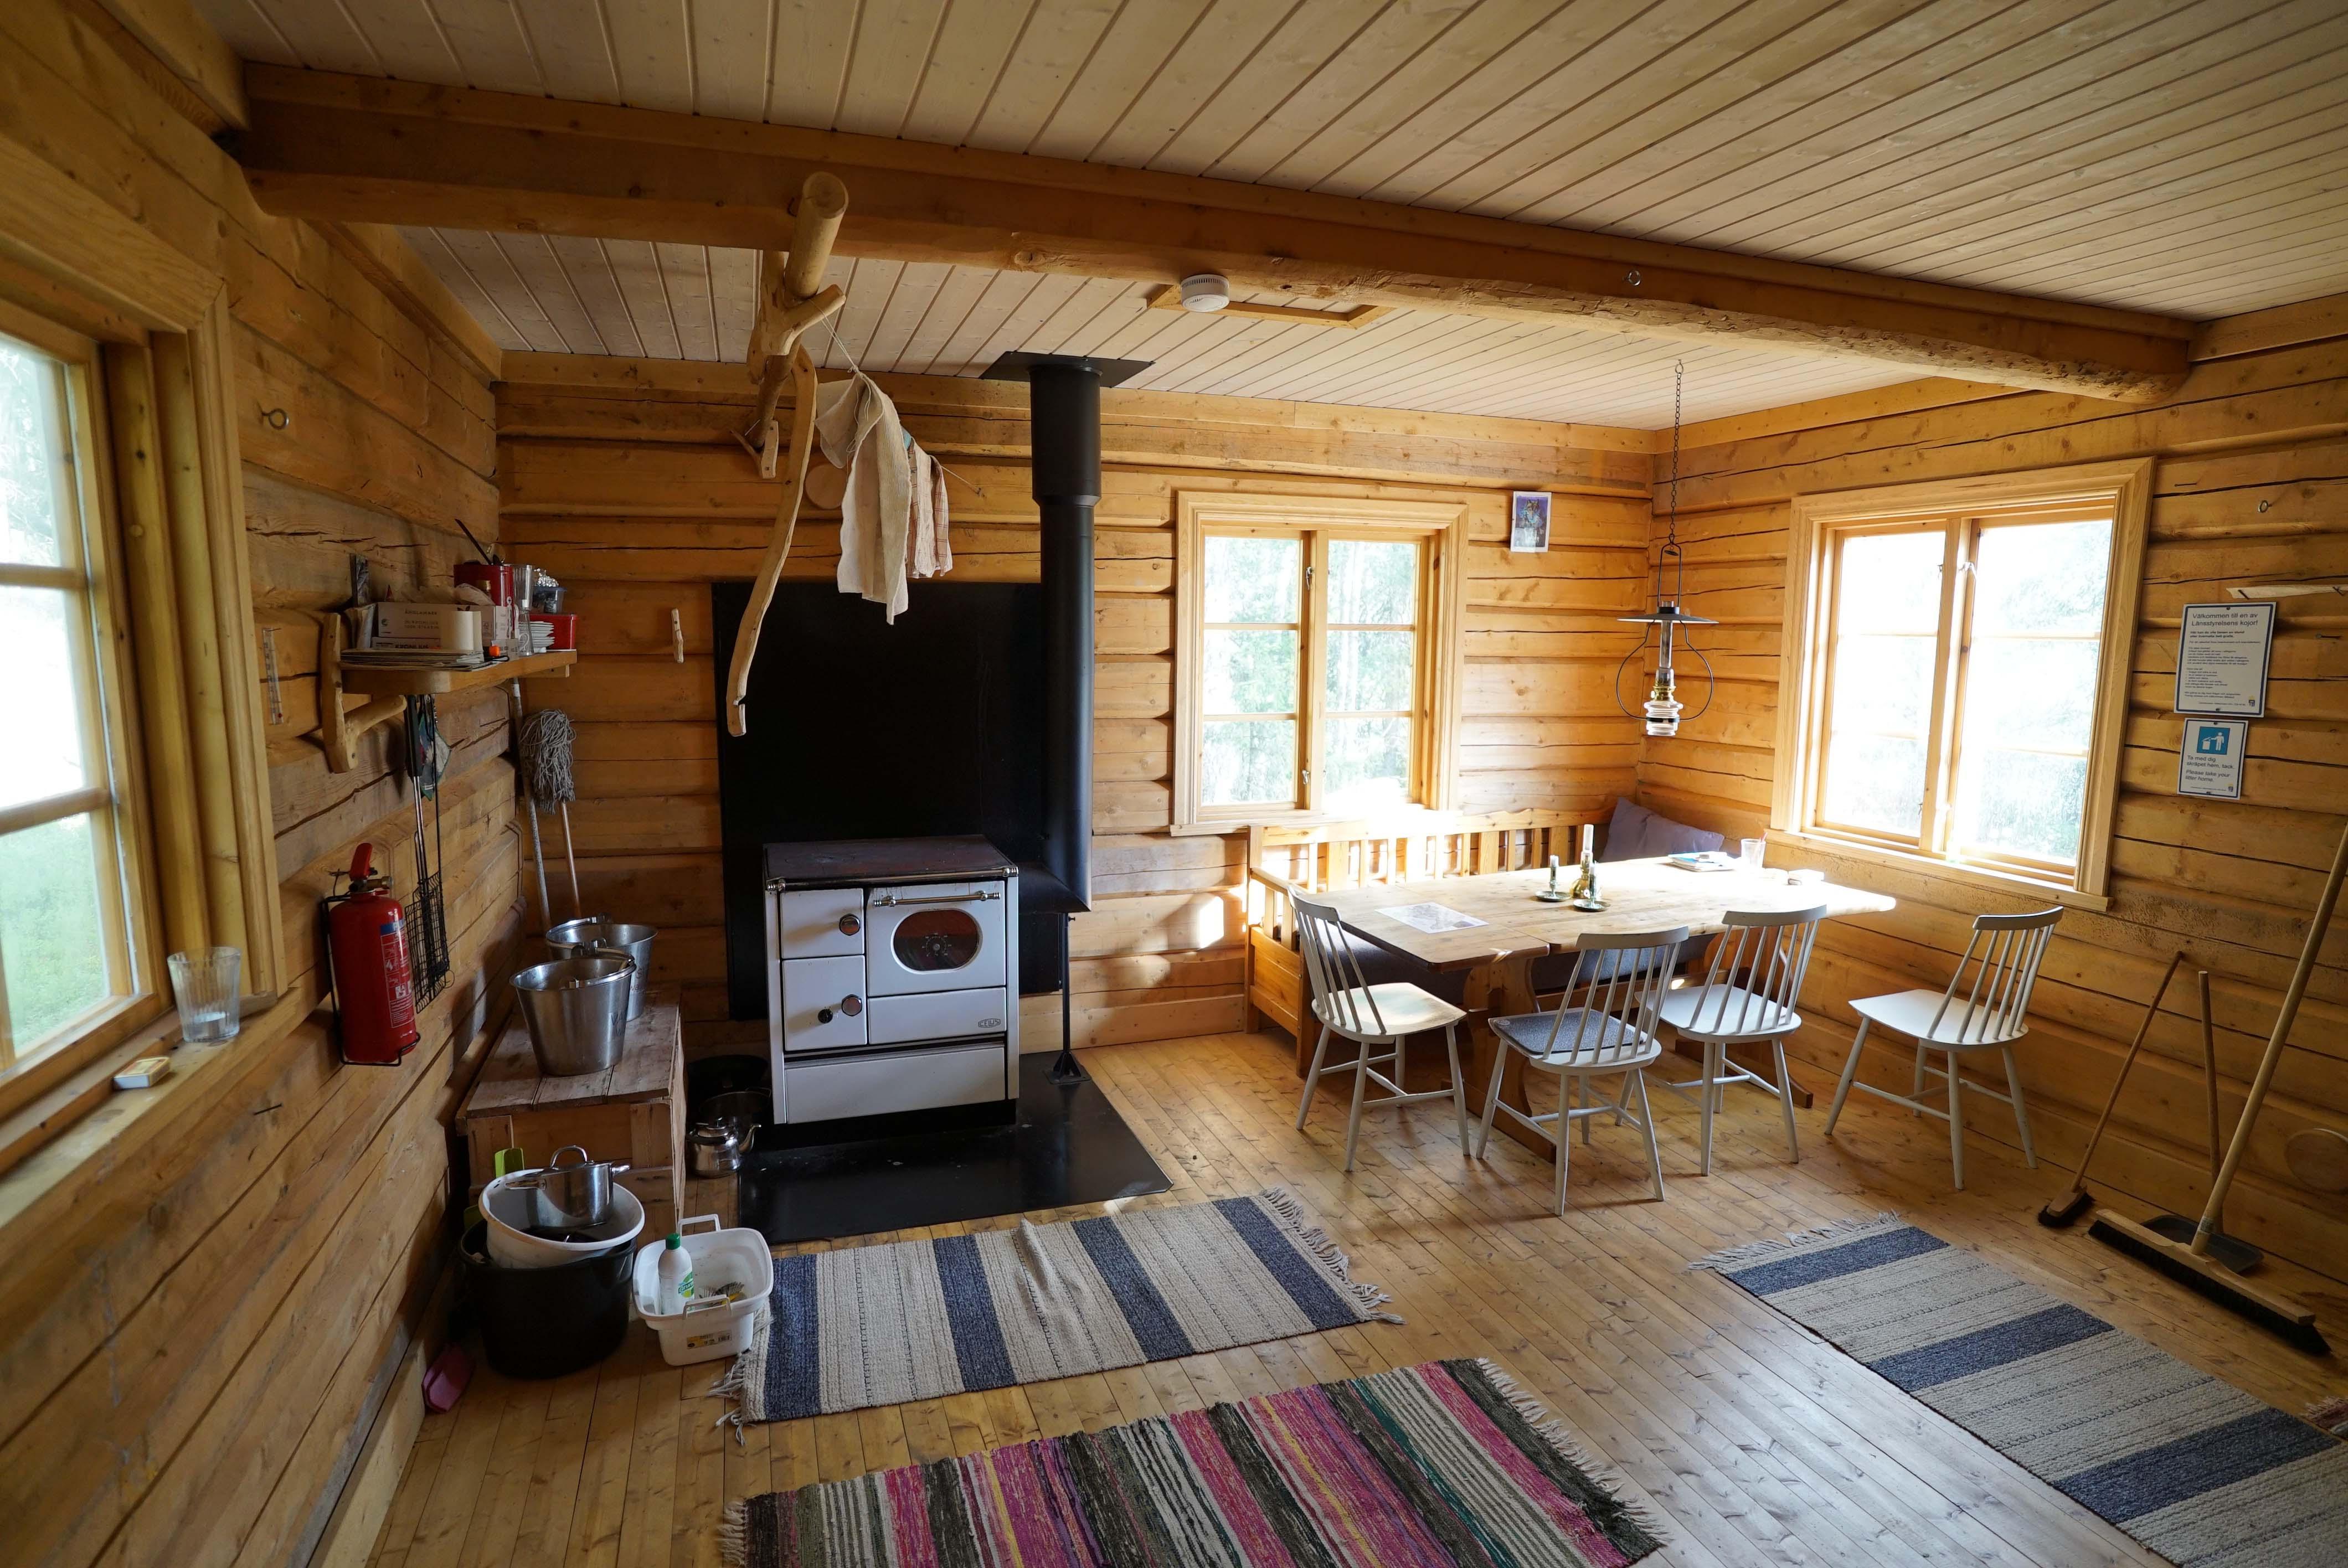 Björnlandets08